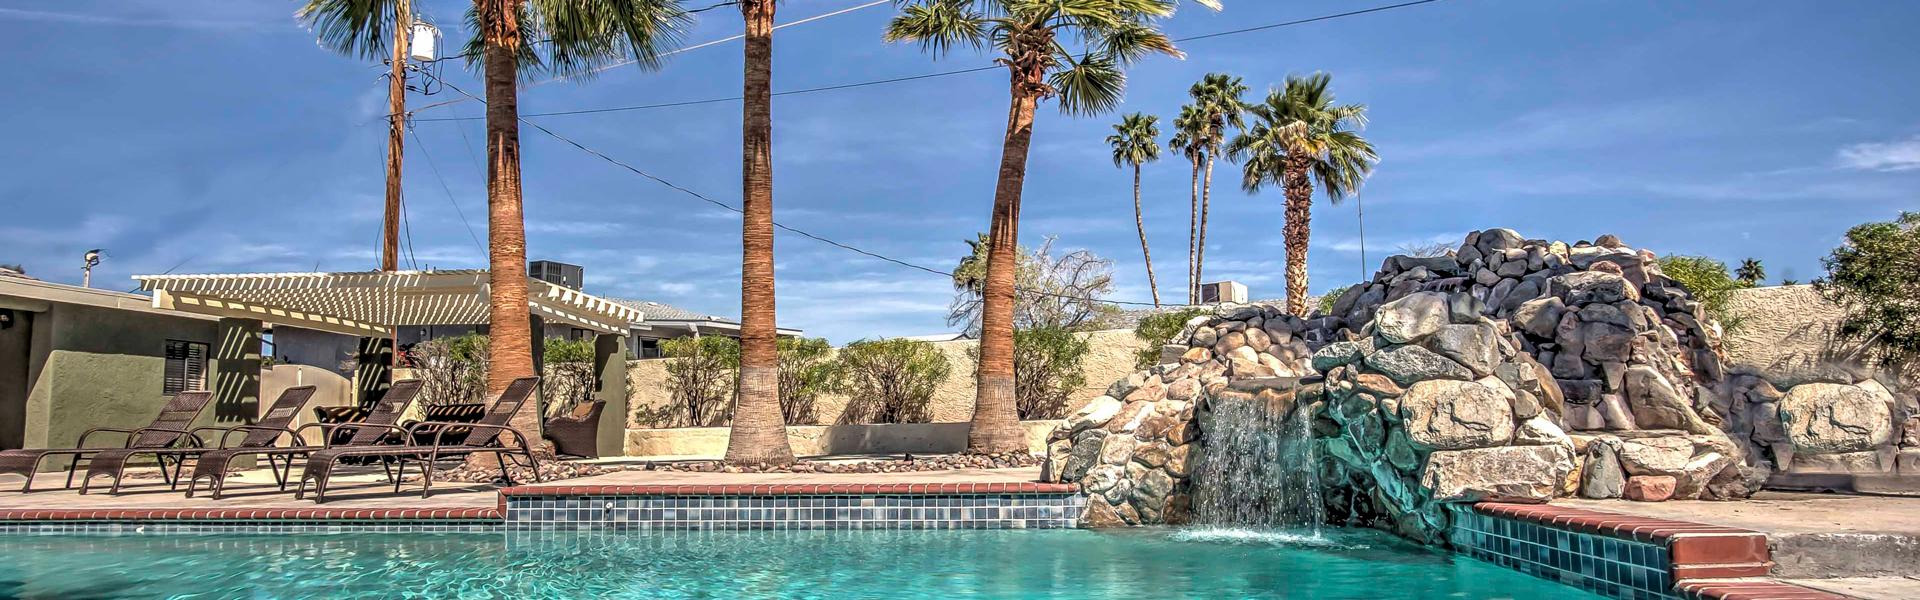 A poolside view in Lake Havasu City, AZ.